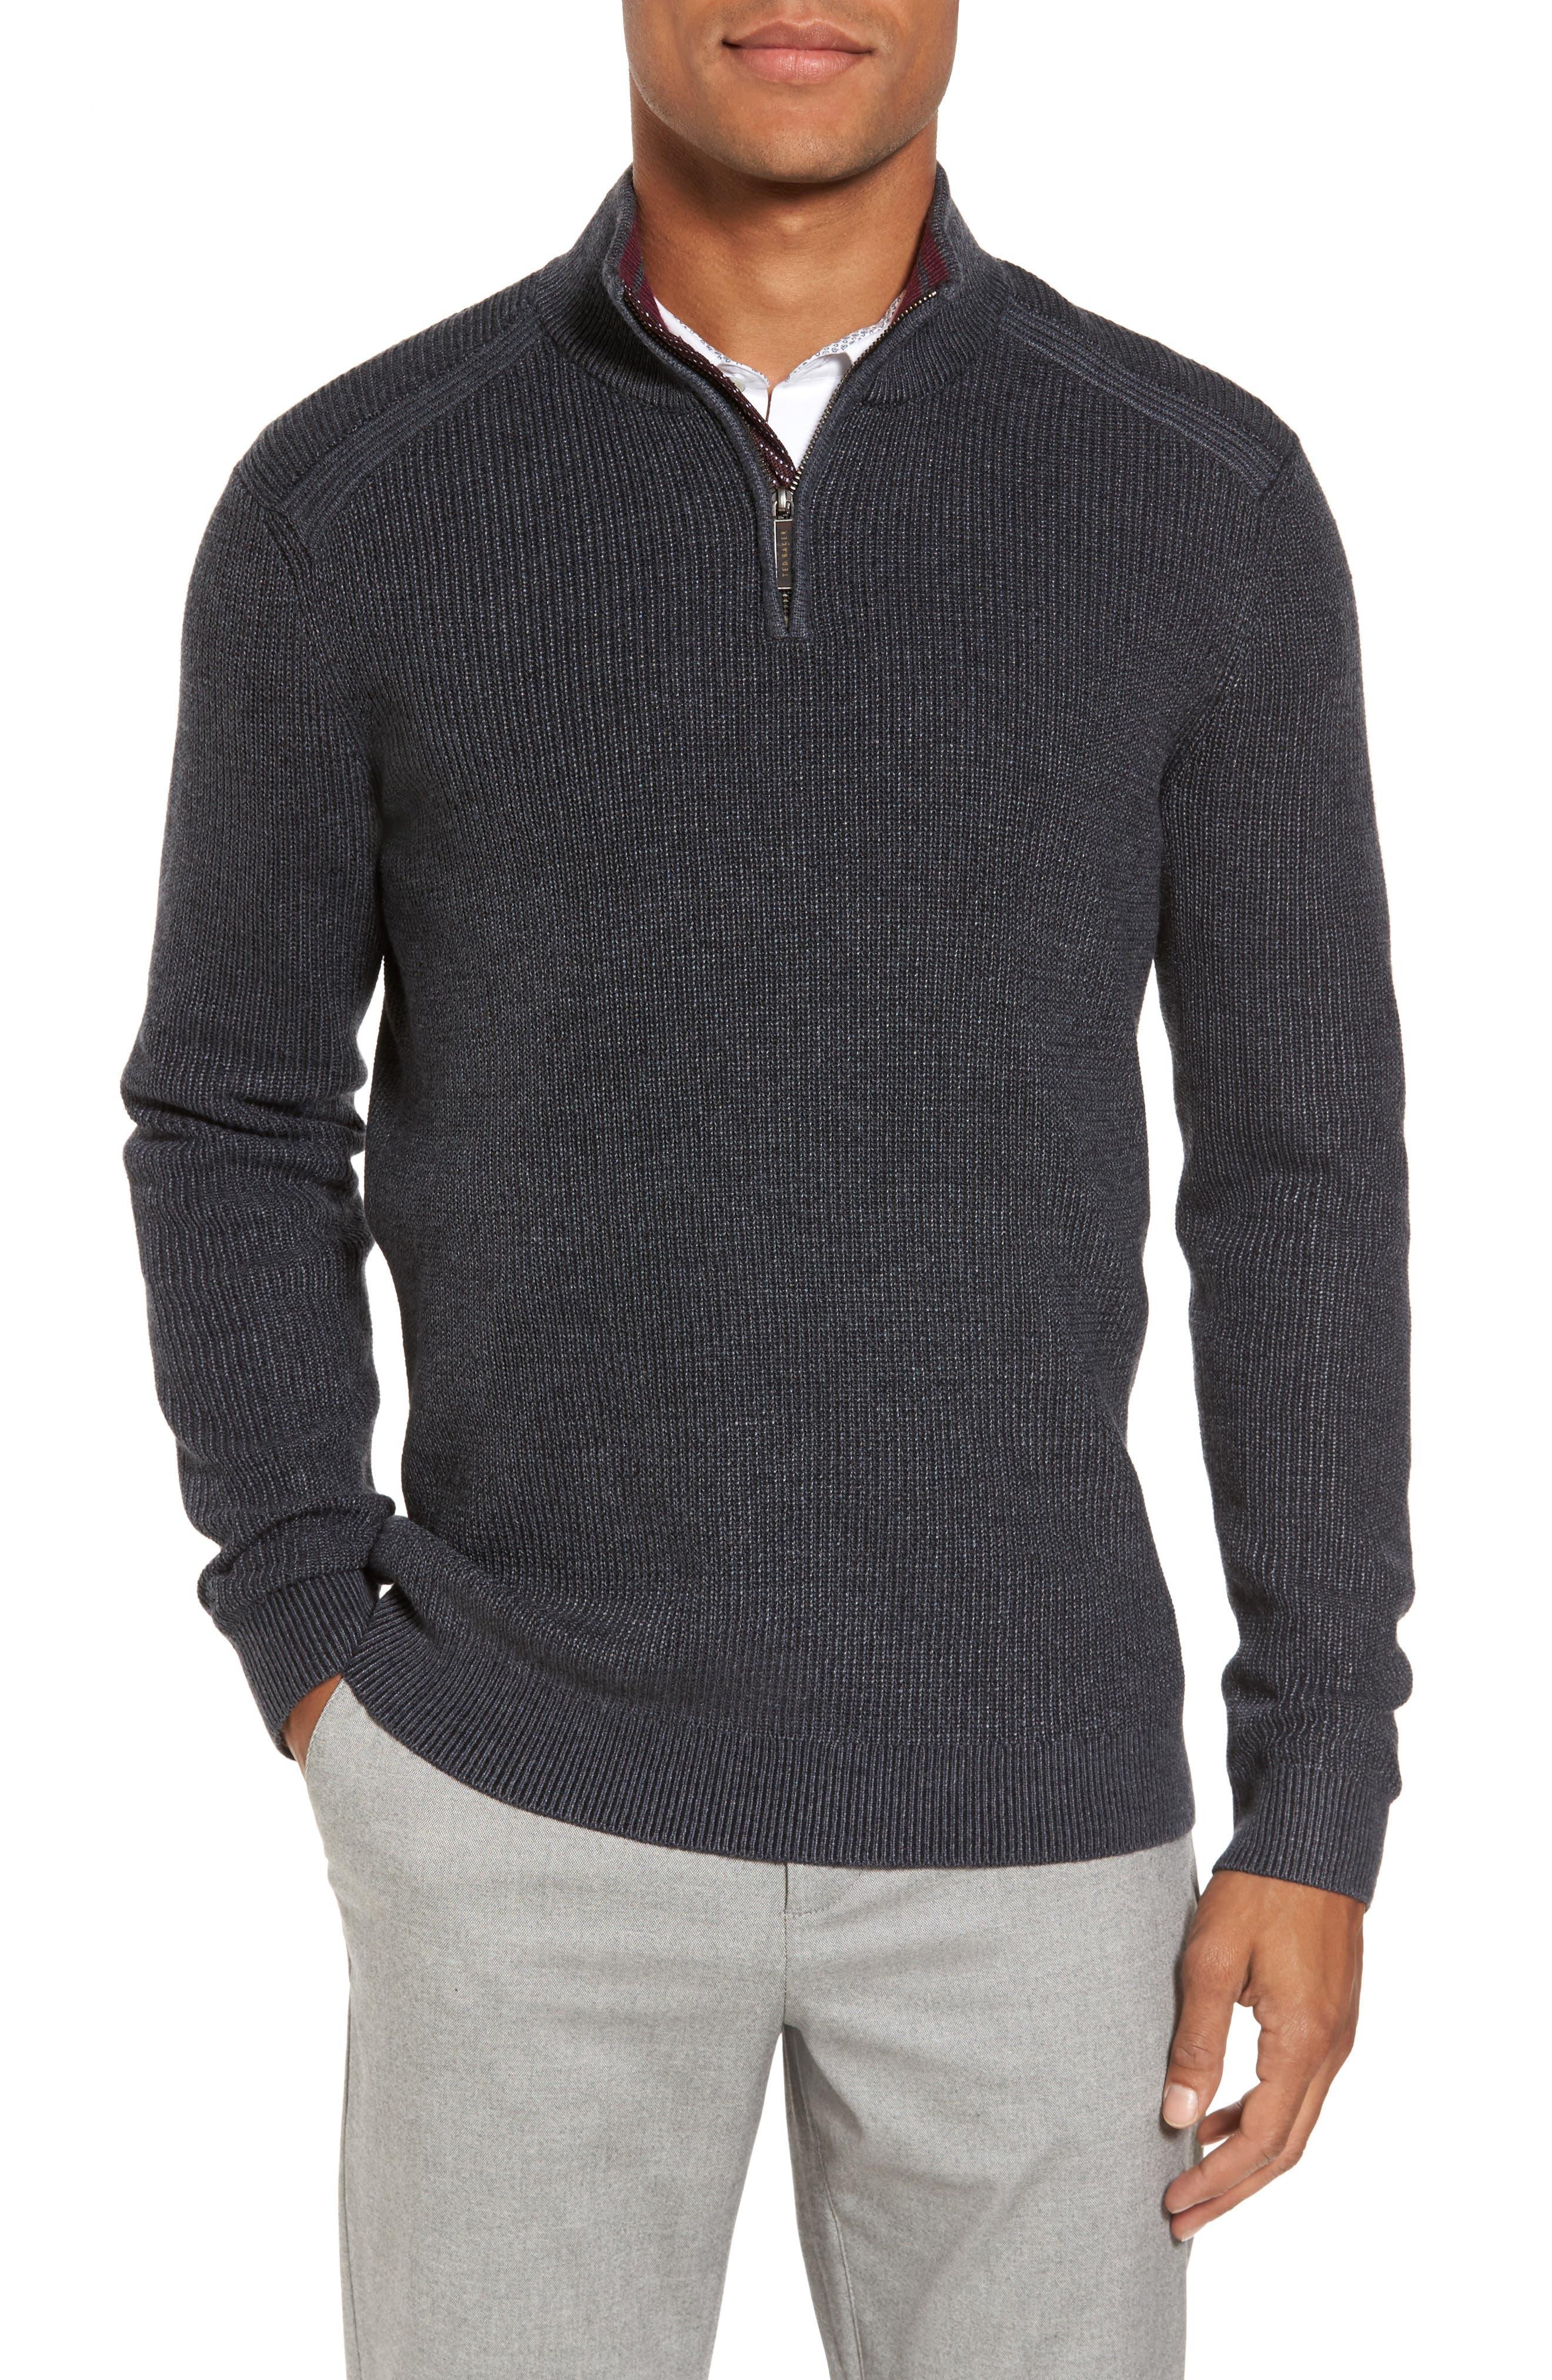 Alternate Image 1 Selected - Ted Baker London Slim Fit Quarter Zip Sweater (Tall)